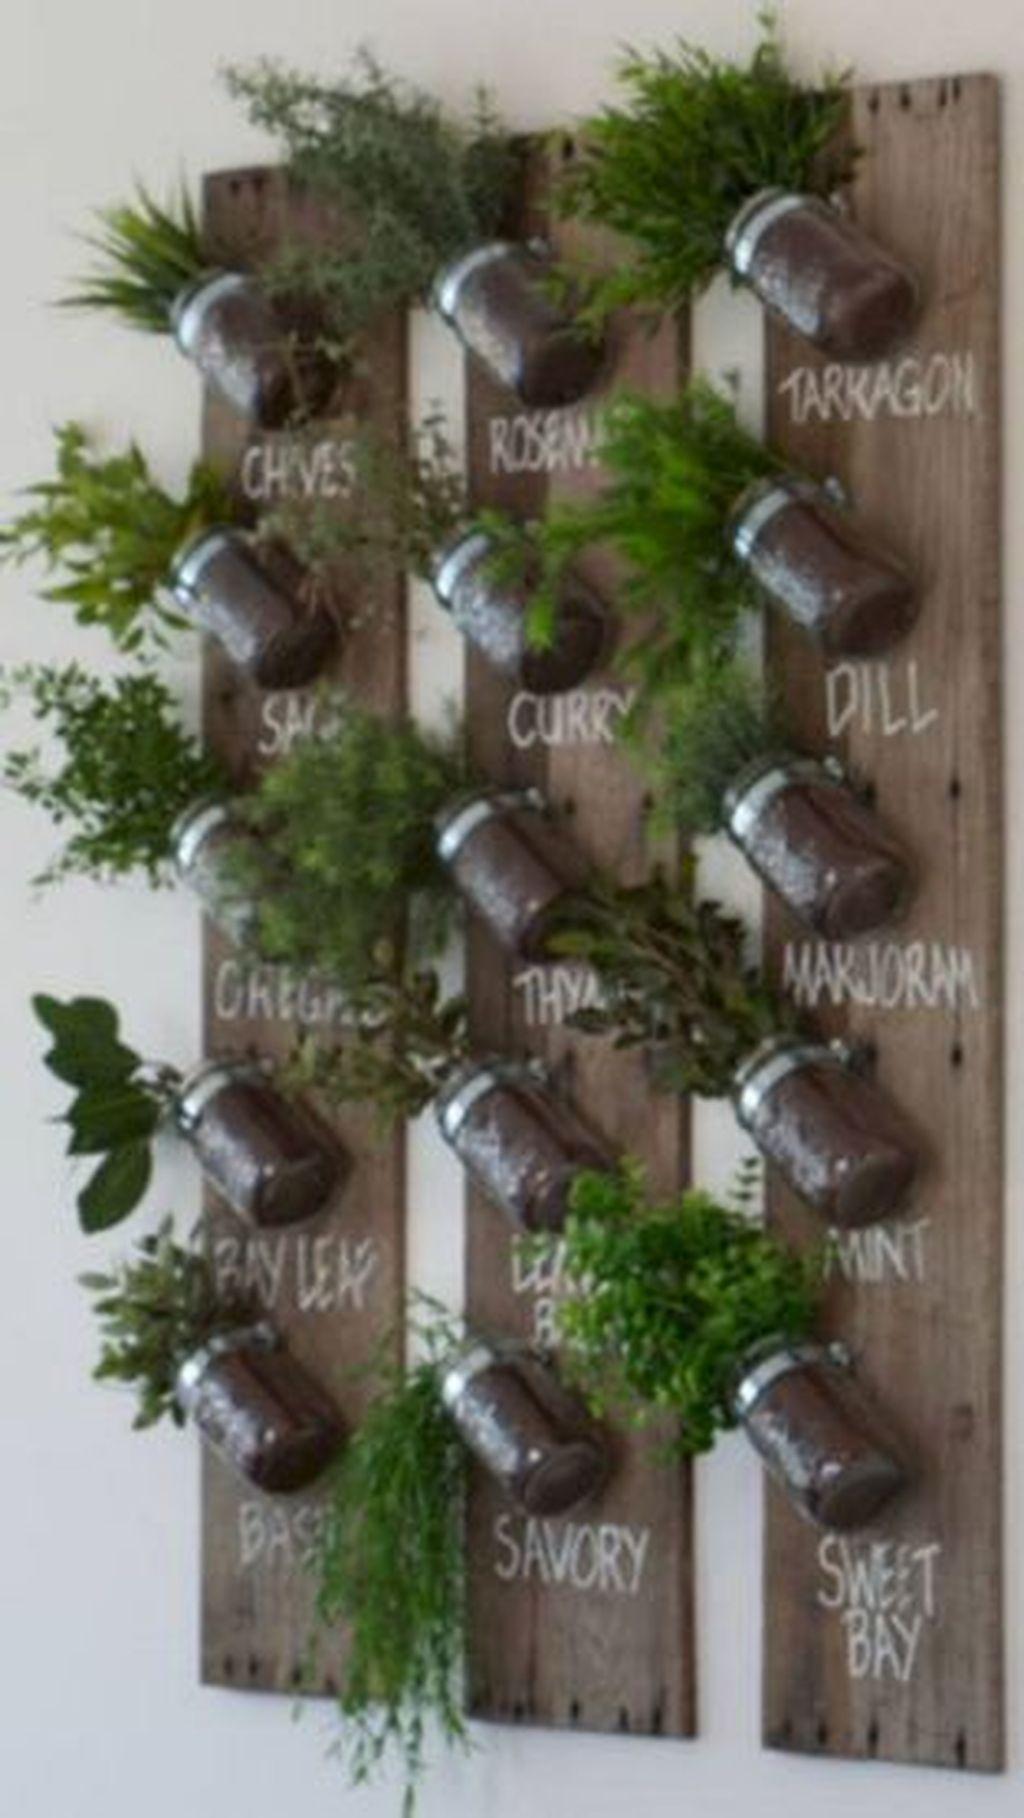 37 Classy Herb Garden Ideas For Indoor Apartment - decoomo.com